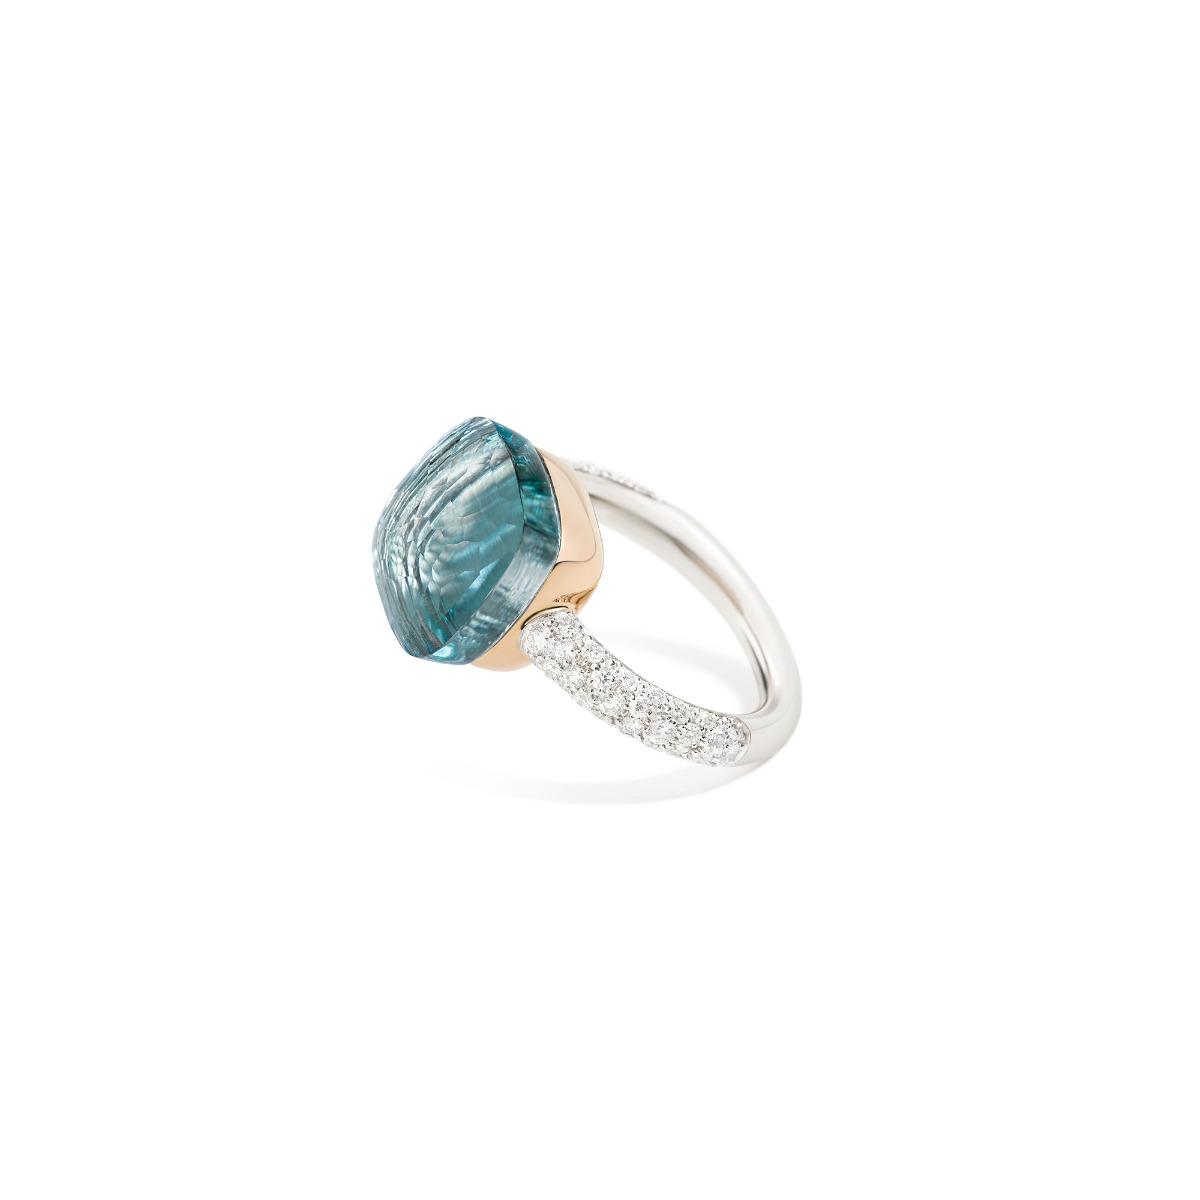 A.B201/O6 / Oi Pomellato / Nude Maxi / Ring / Rose Gold